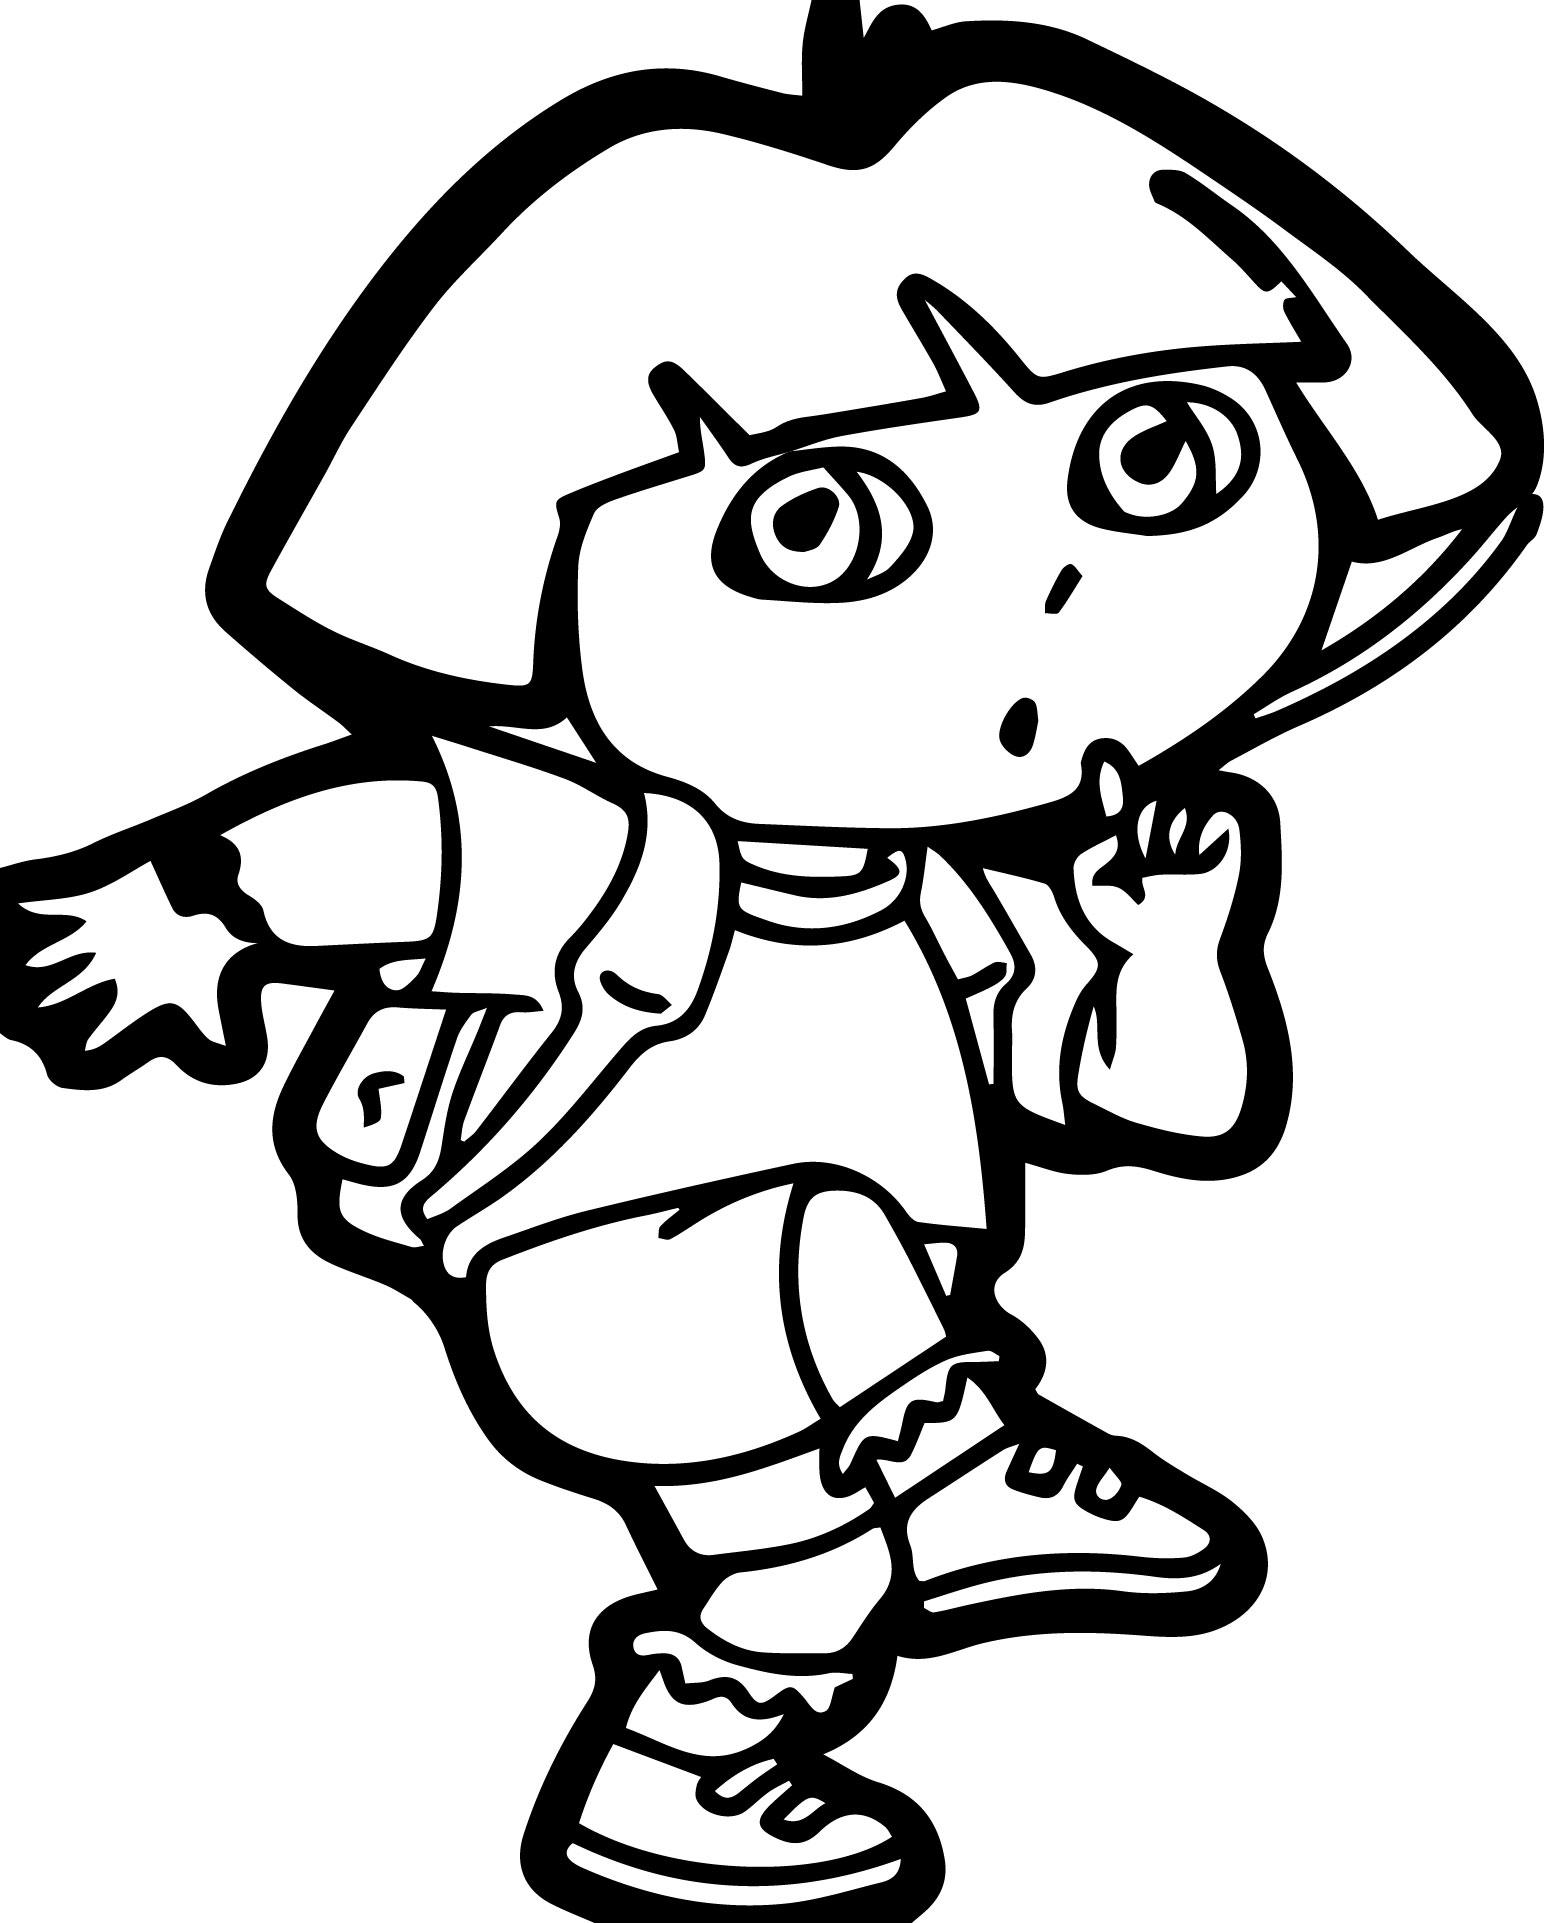 Dora Image Sshh Coloring Page